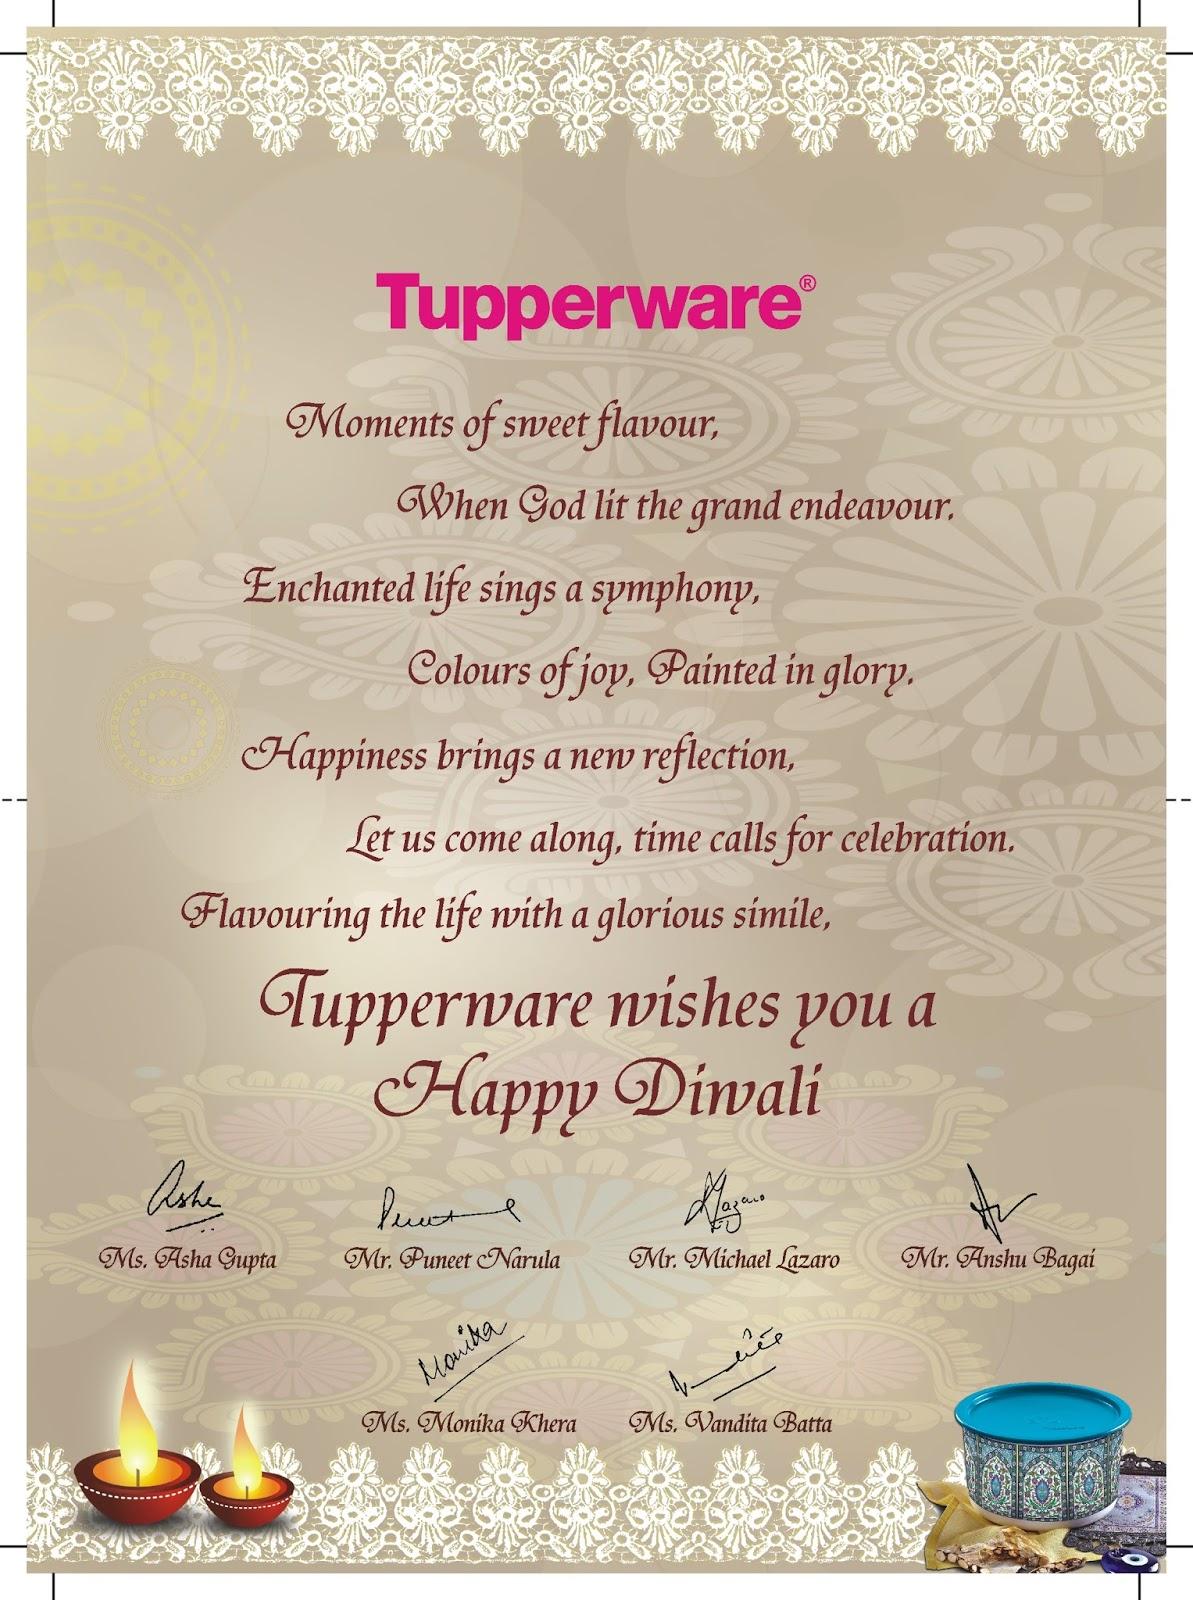 Creative work tupperware diwali invitation card tupperware diwali invitation card stopboris Gallery